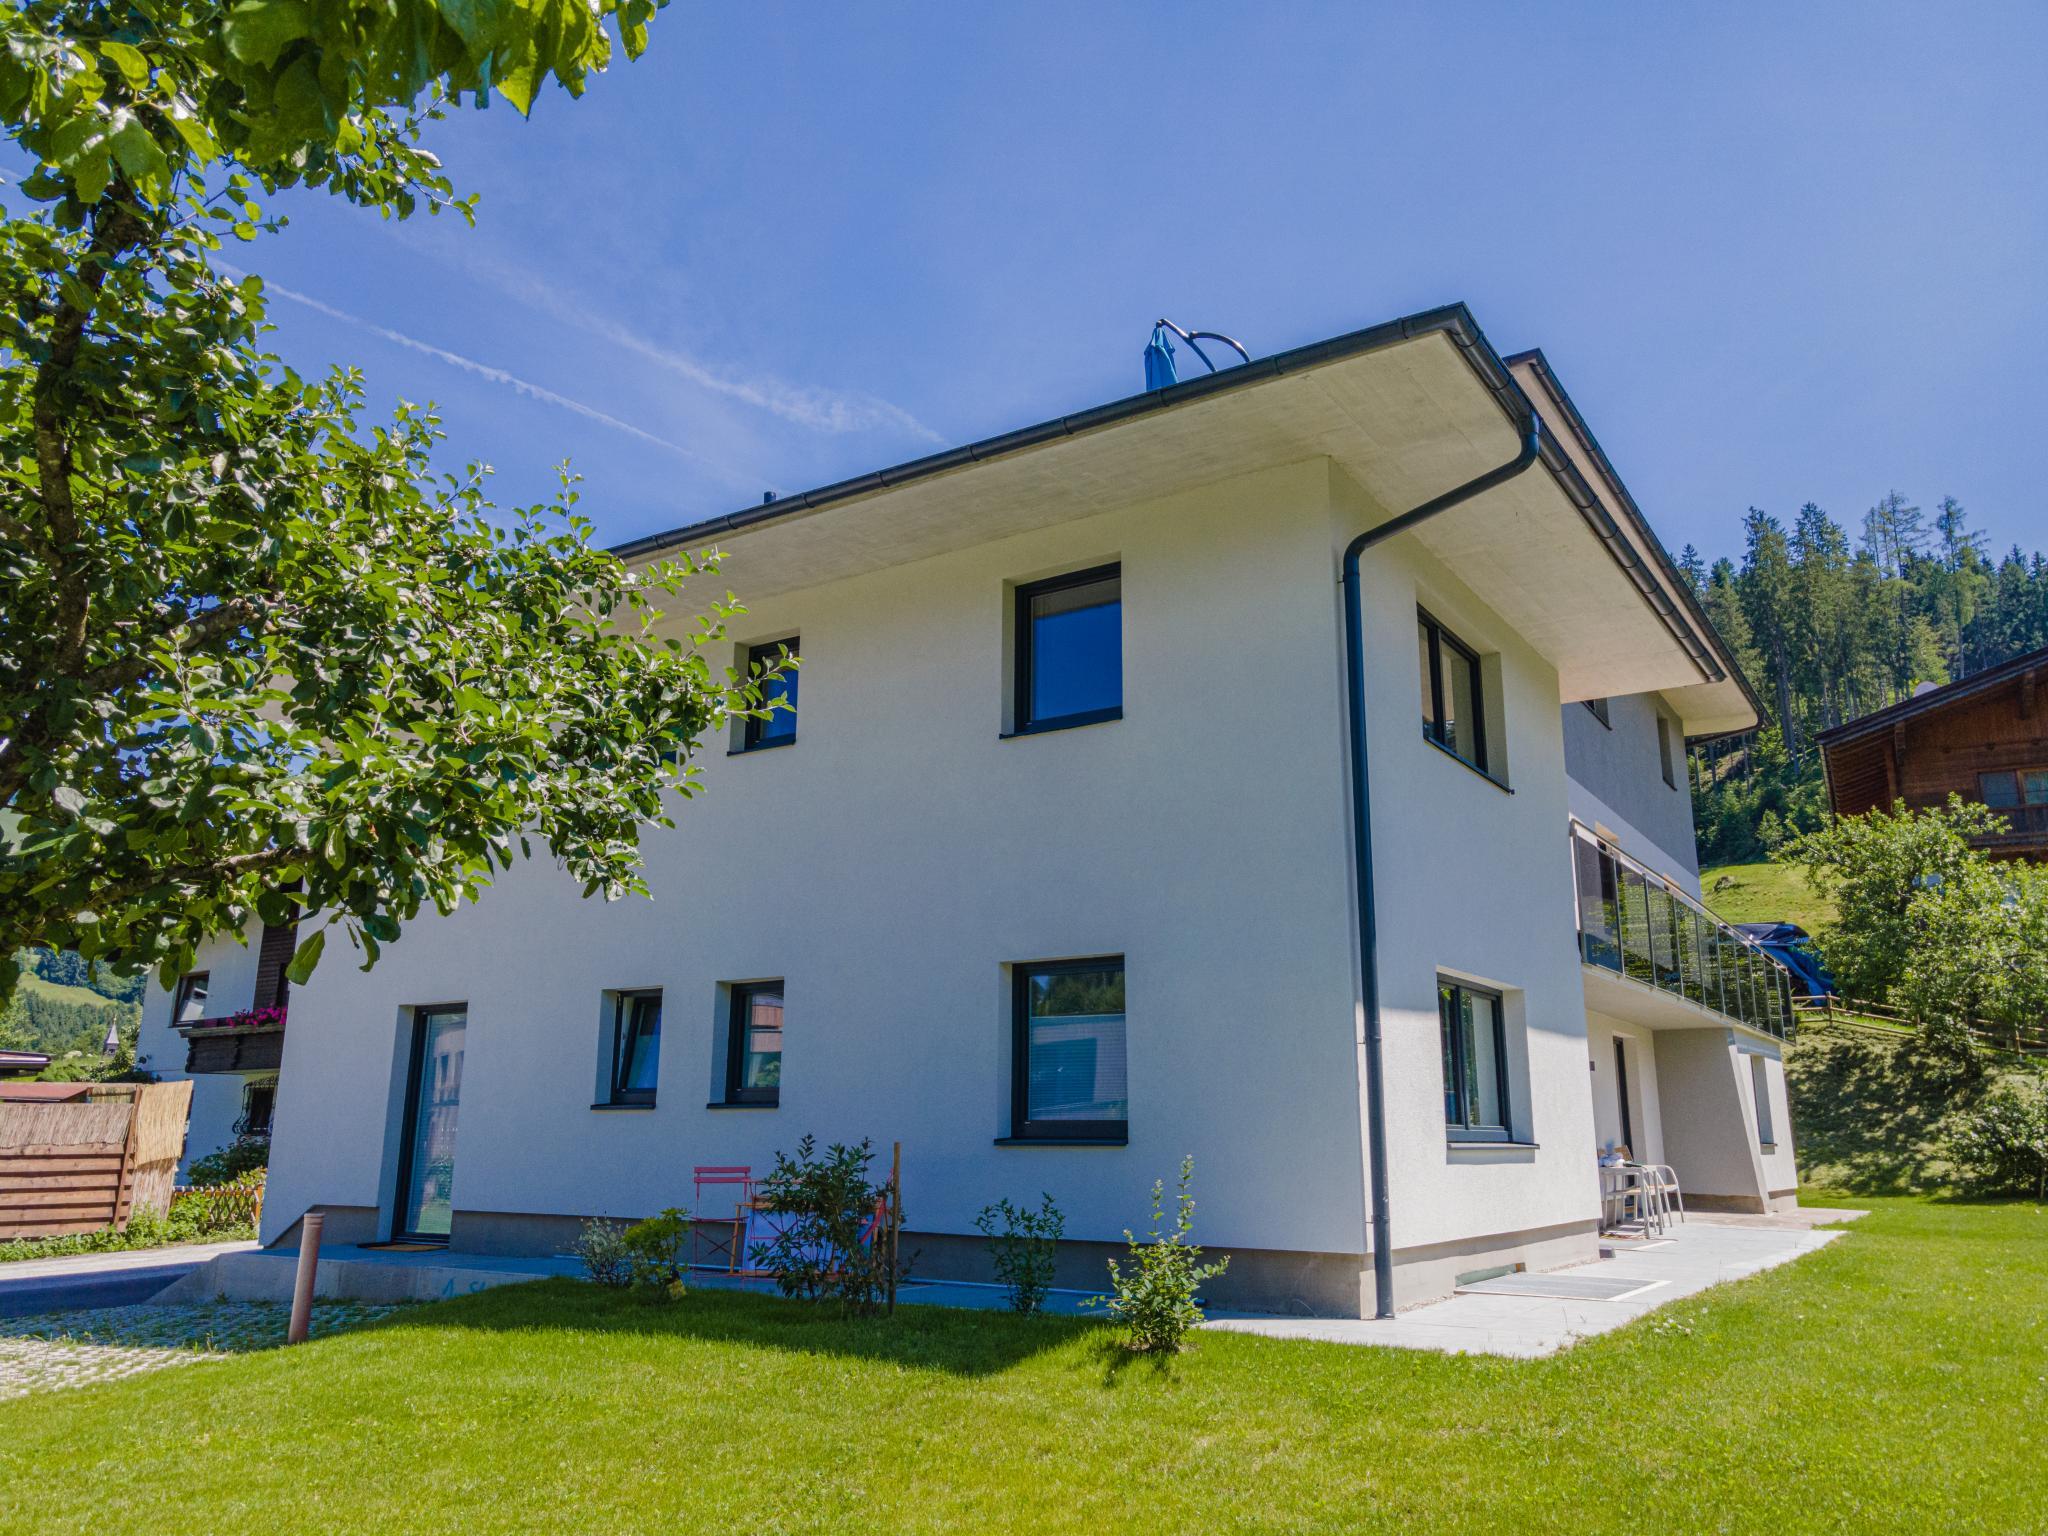 Tirola Bude Lisi Sepp Top 3 4 Tirol